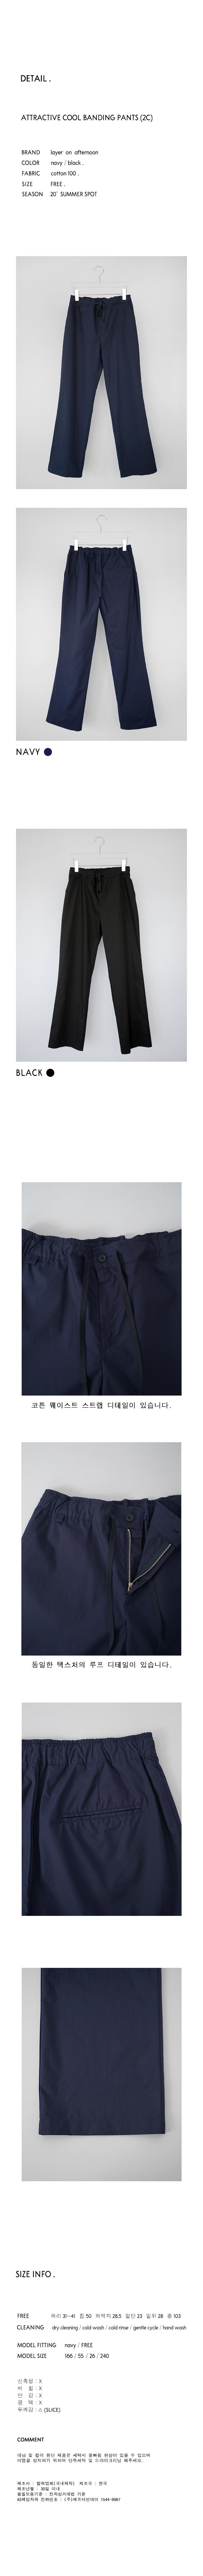 attractive cool banding pants